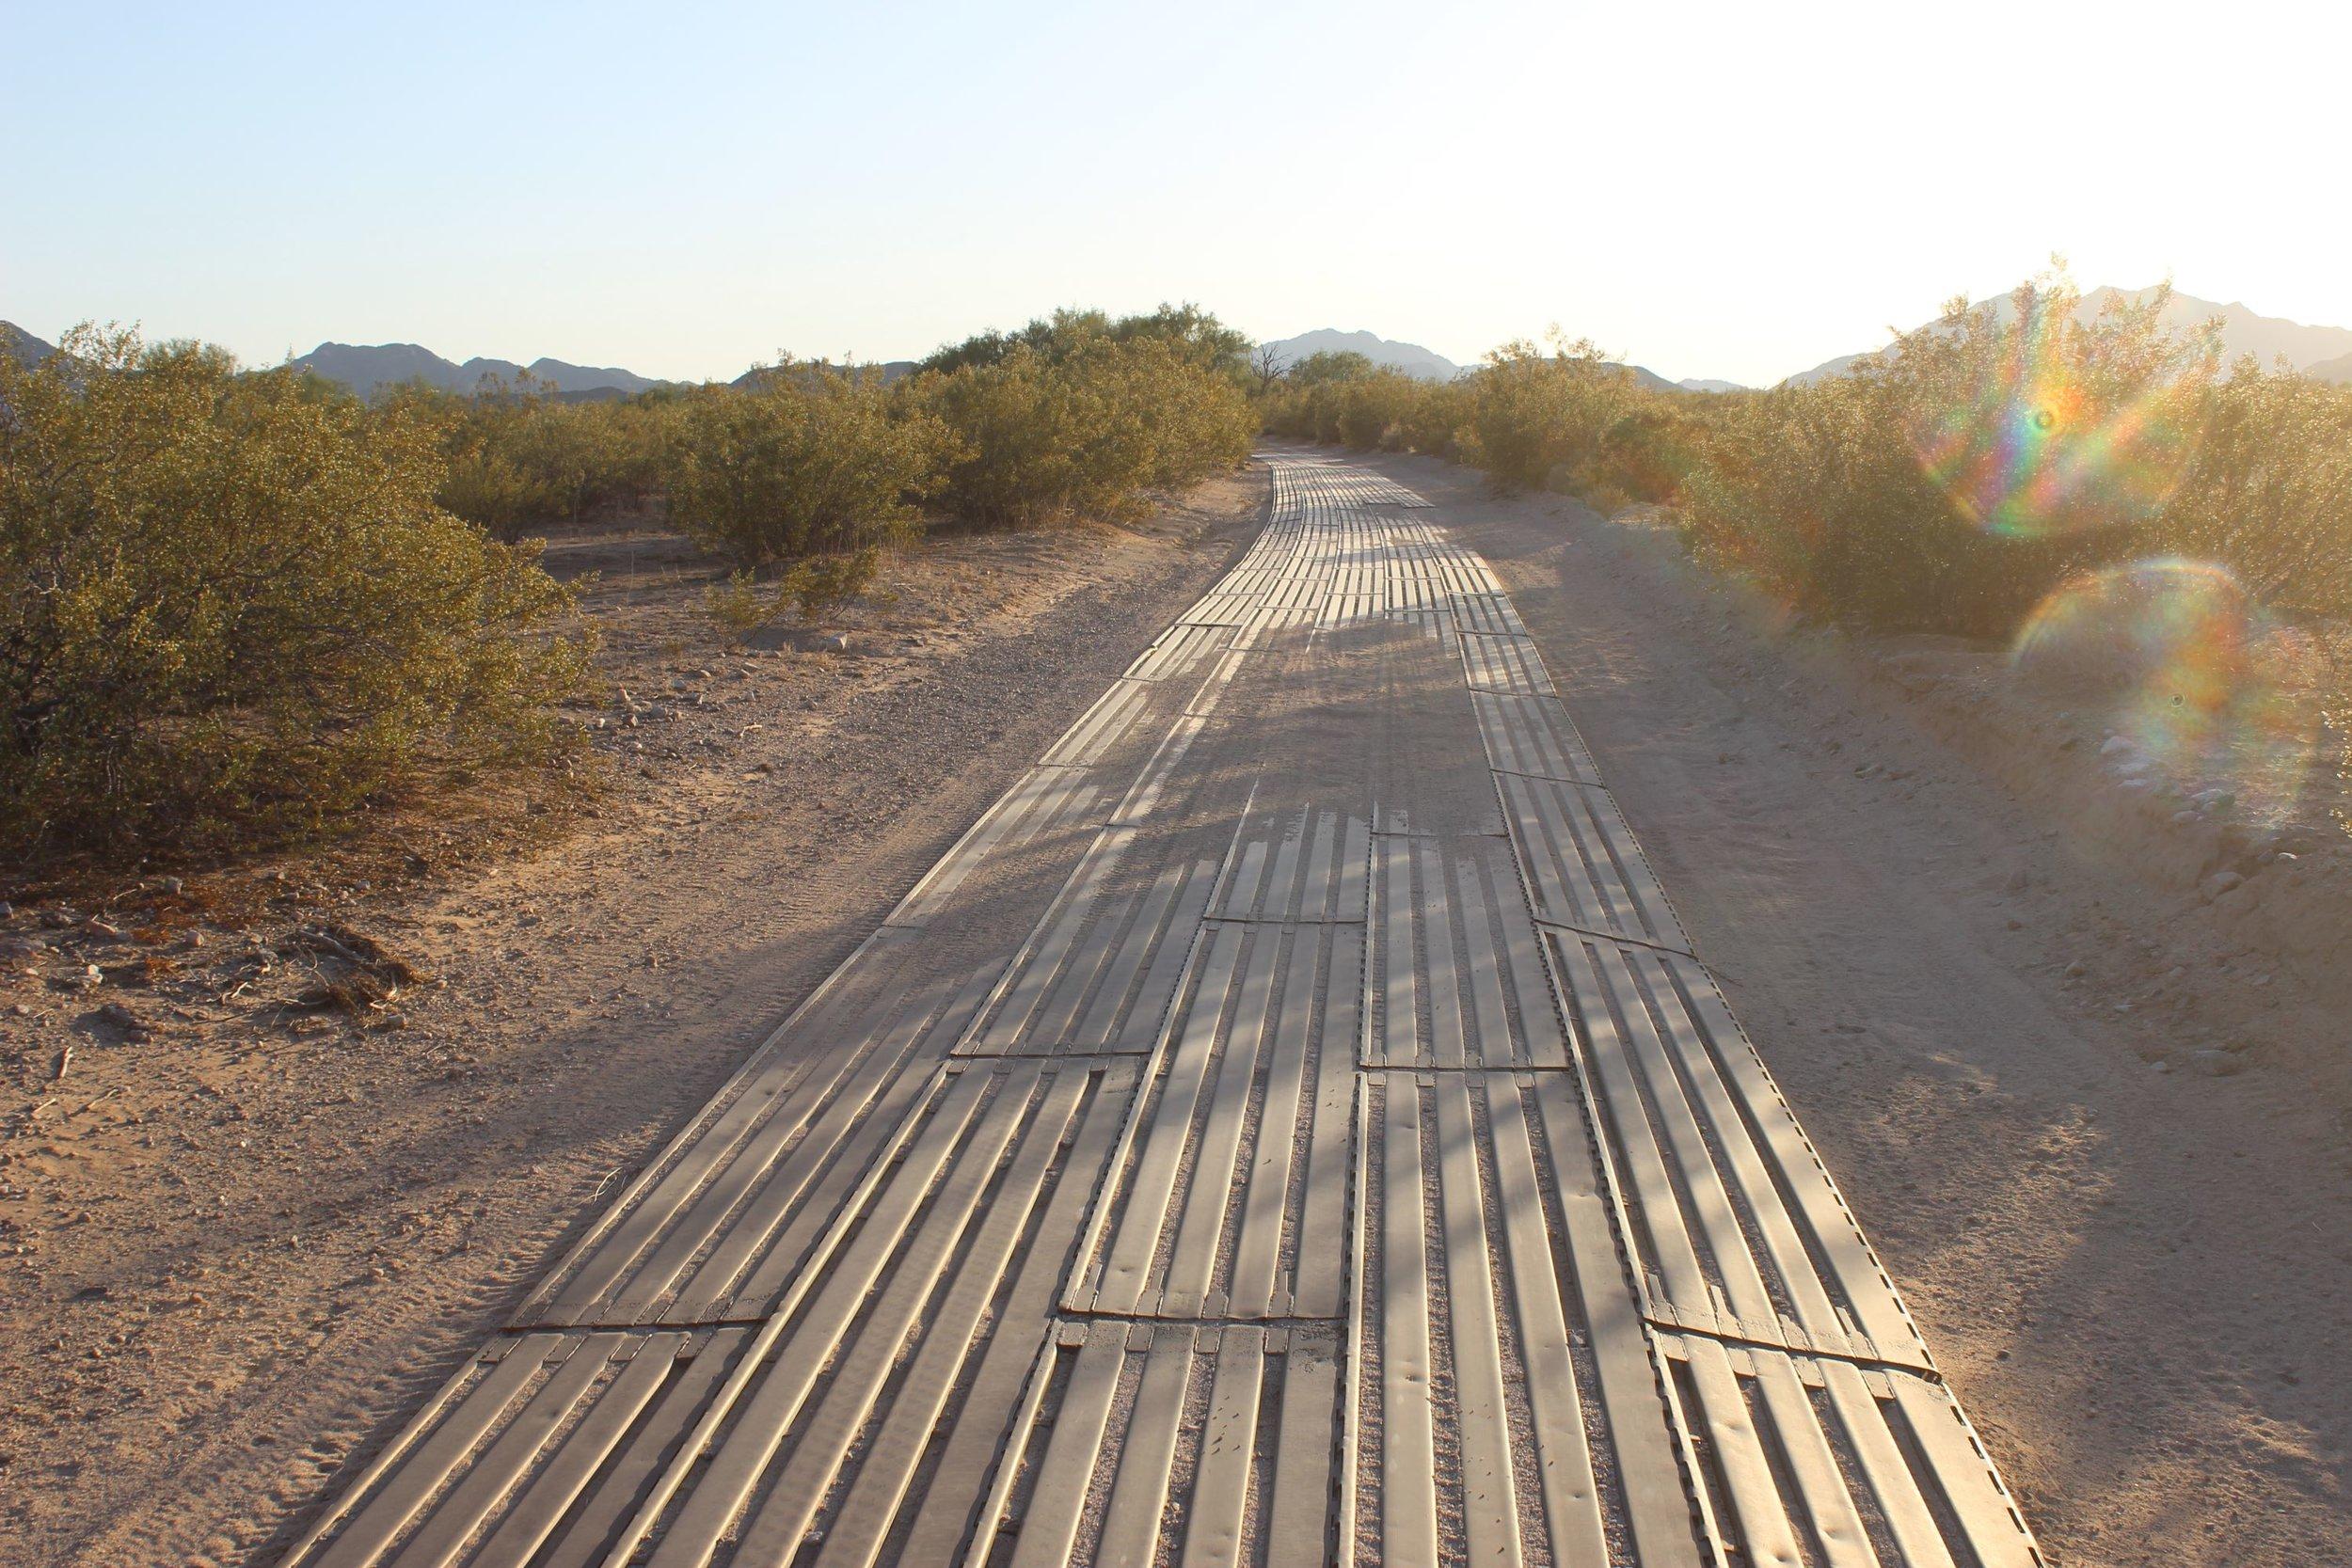 Steel planks line El Camino in the Growler Valley.